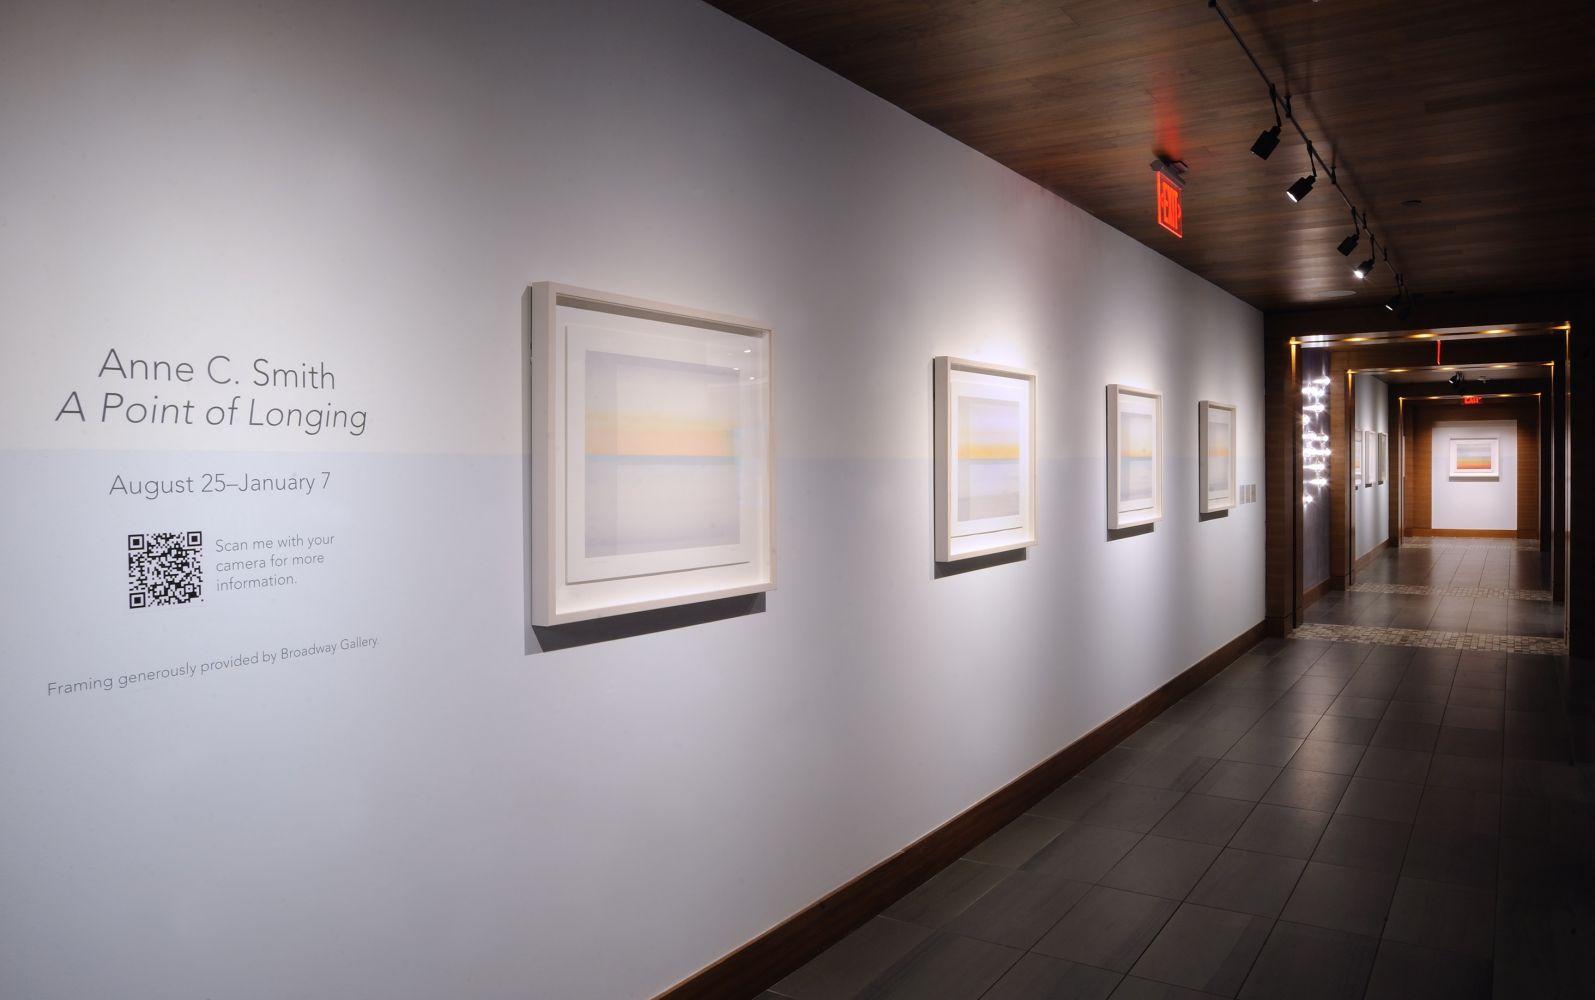 Installation view of Anne C. Smith exhibition